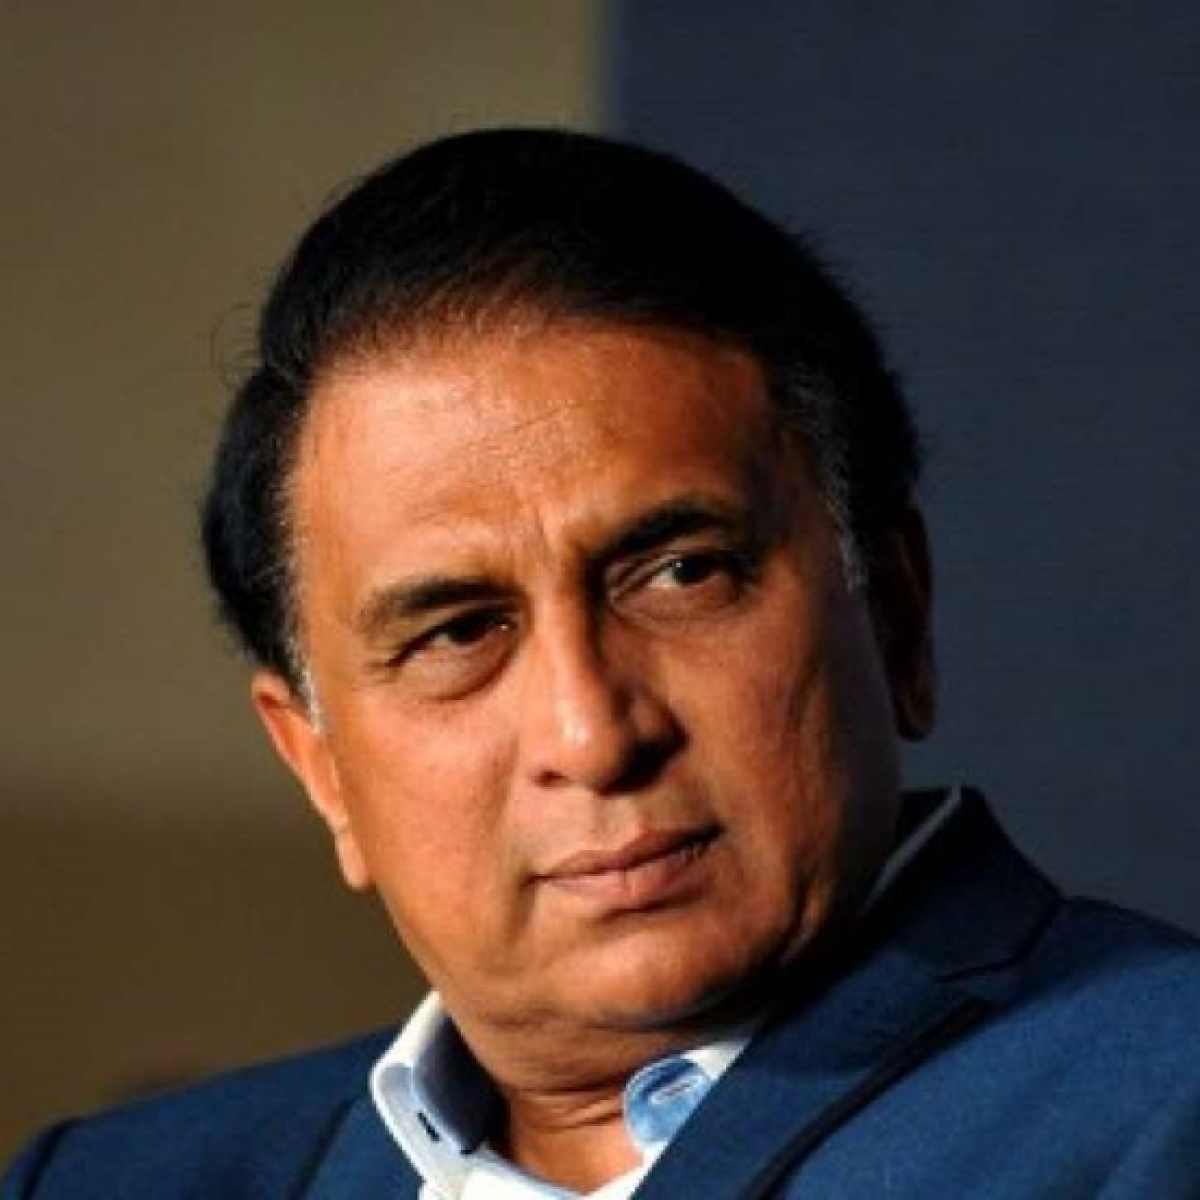 'How can I 'muskura'?': Sunil Gavaskar pays heartfelt tribute to his longest-serving opening partner Chetan Chauhan